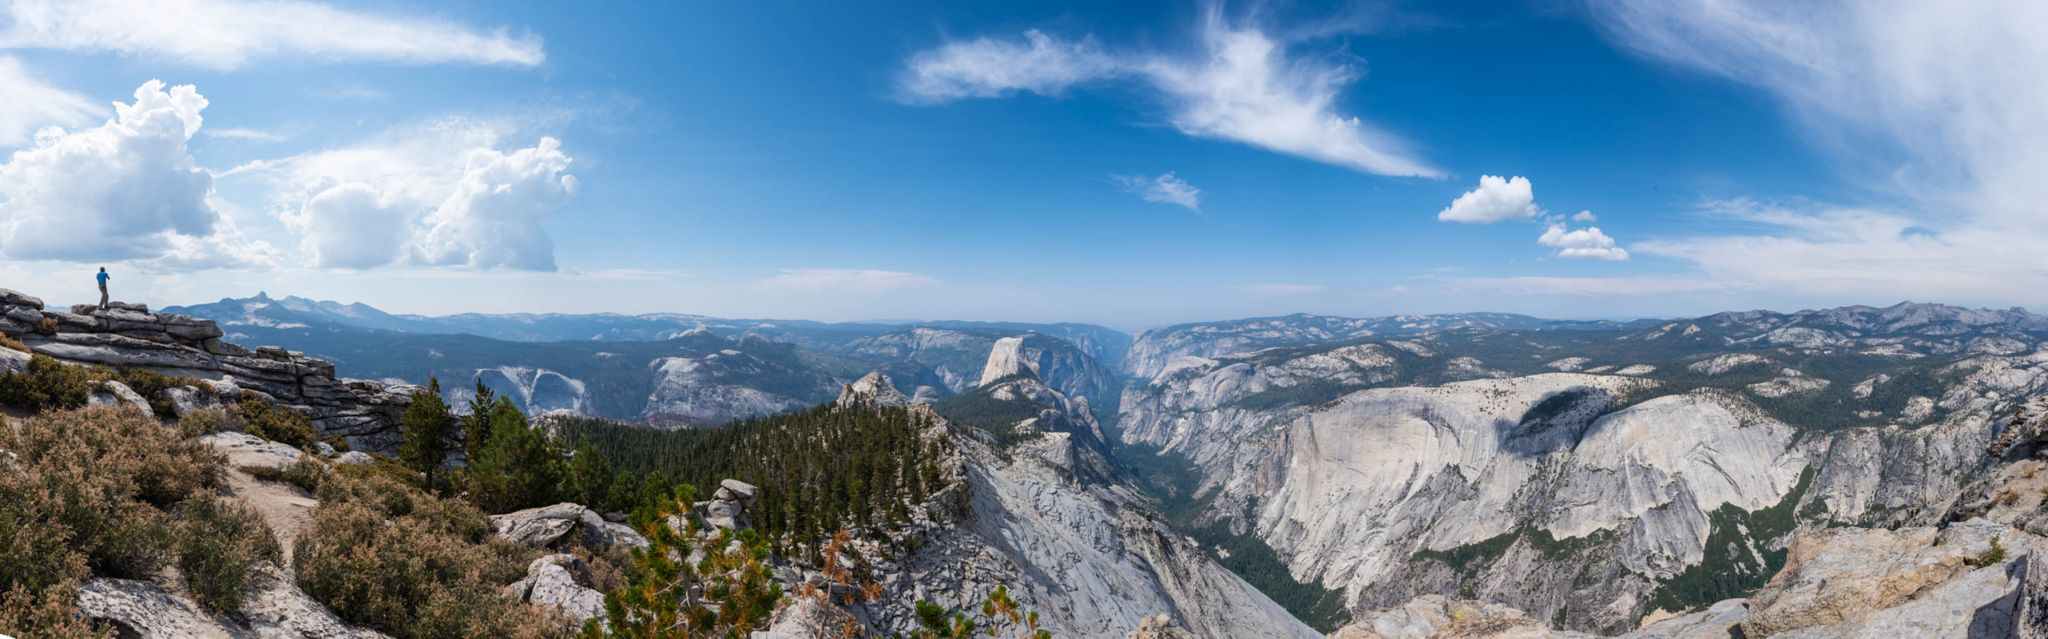 Half Dome from Cloud's Rest Peak, Yosemite, USA